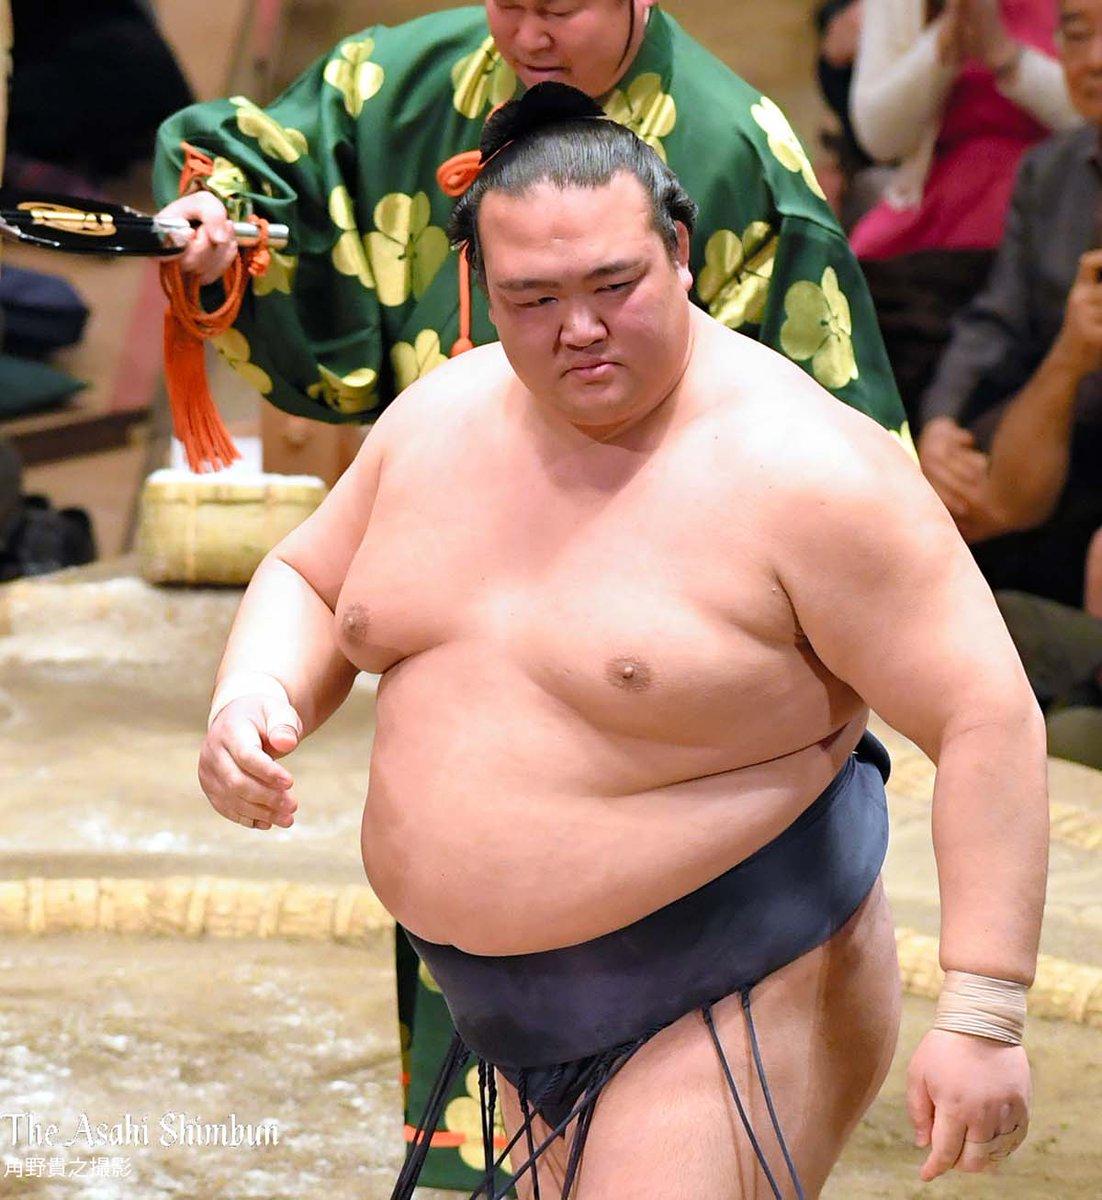 t.asahi.com/ms1i 大相撲初場所で初優勝を決めている大関稀勢の里の横綱昇進が確実になり…